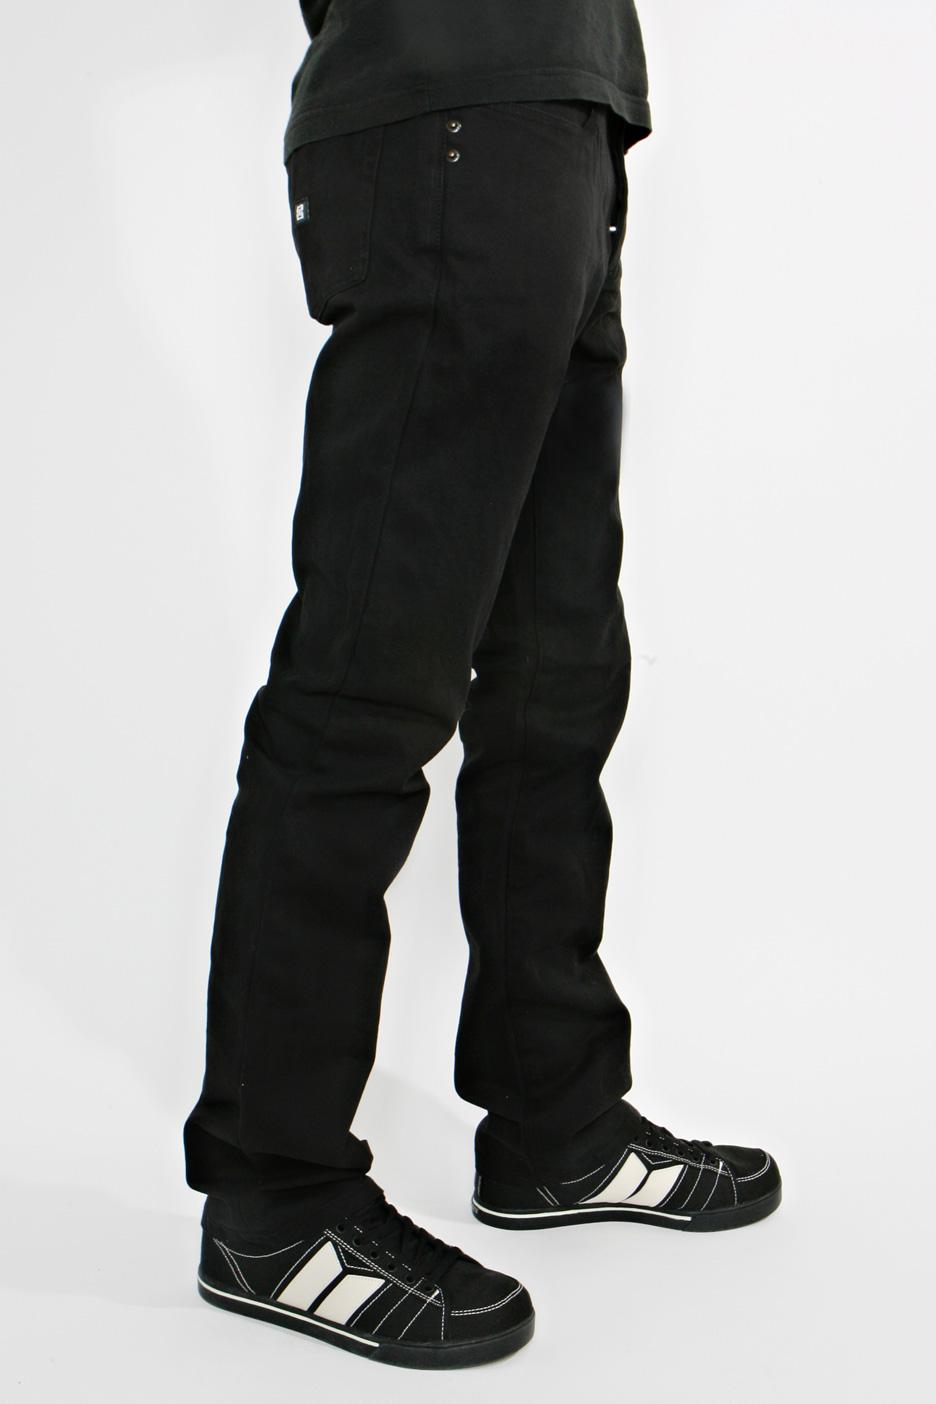 kr3w kslimtwill black jeans side lg - *$* Trendz in BLACK *$*